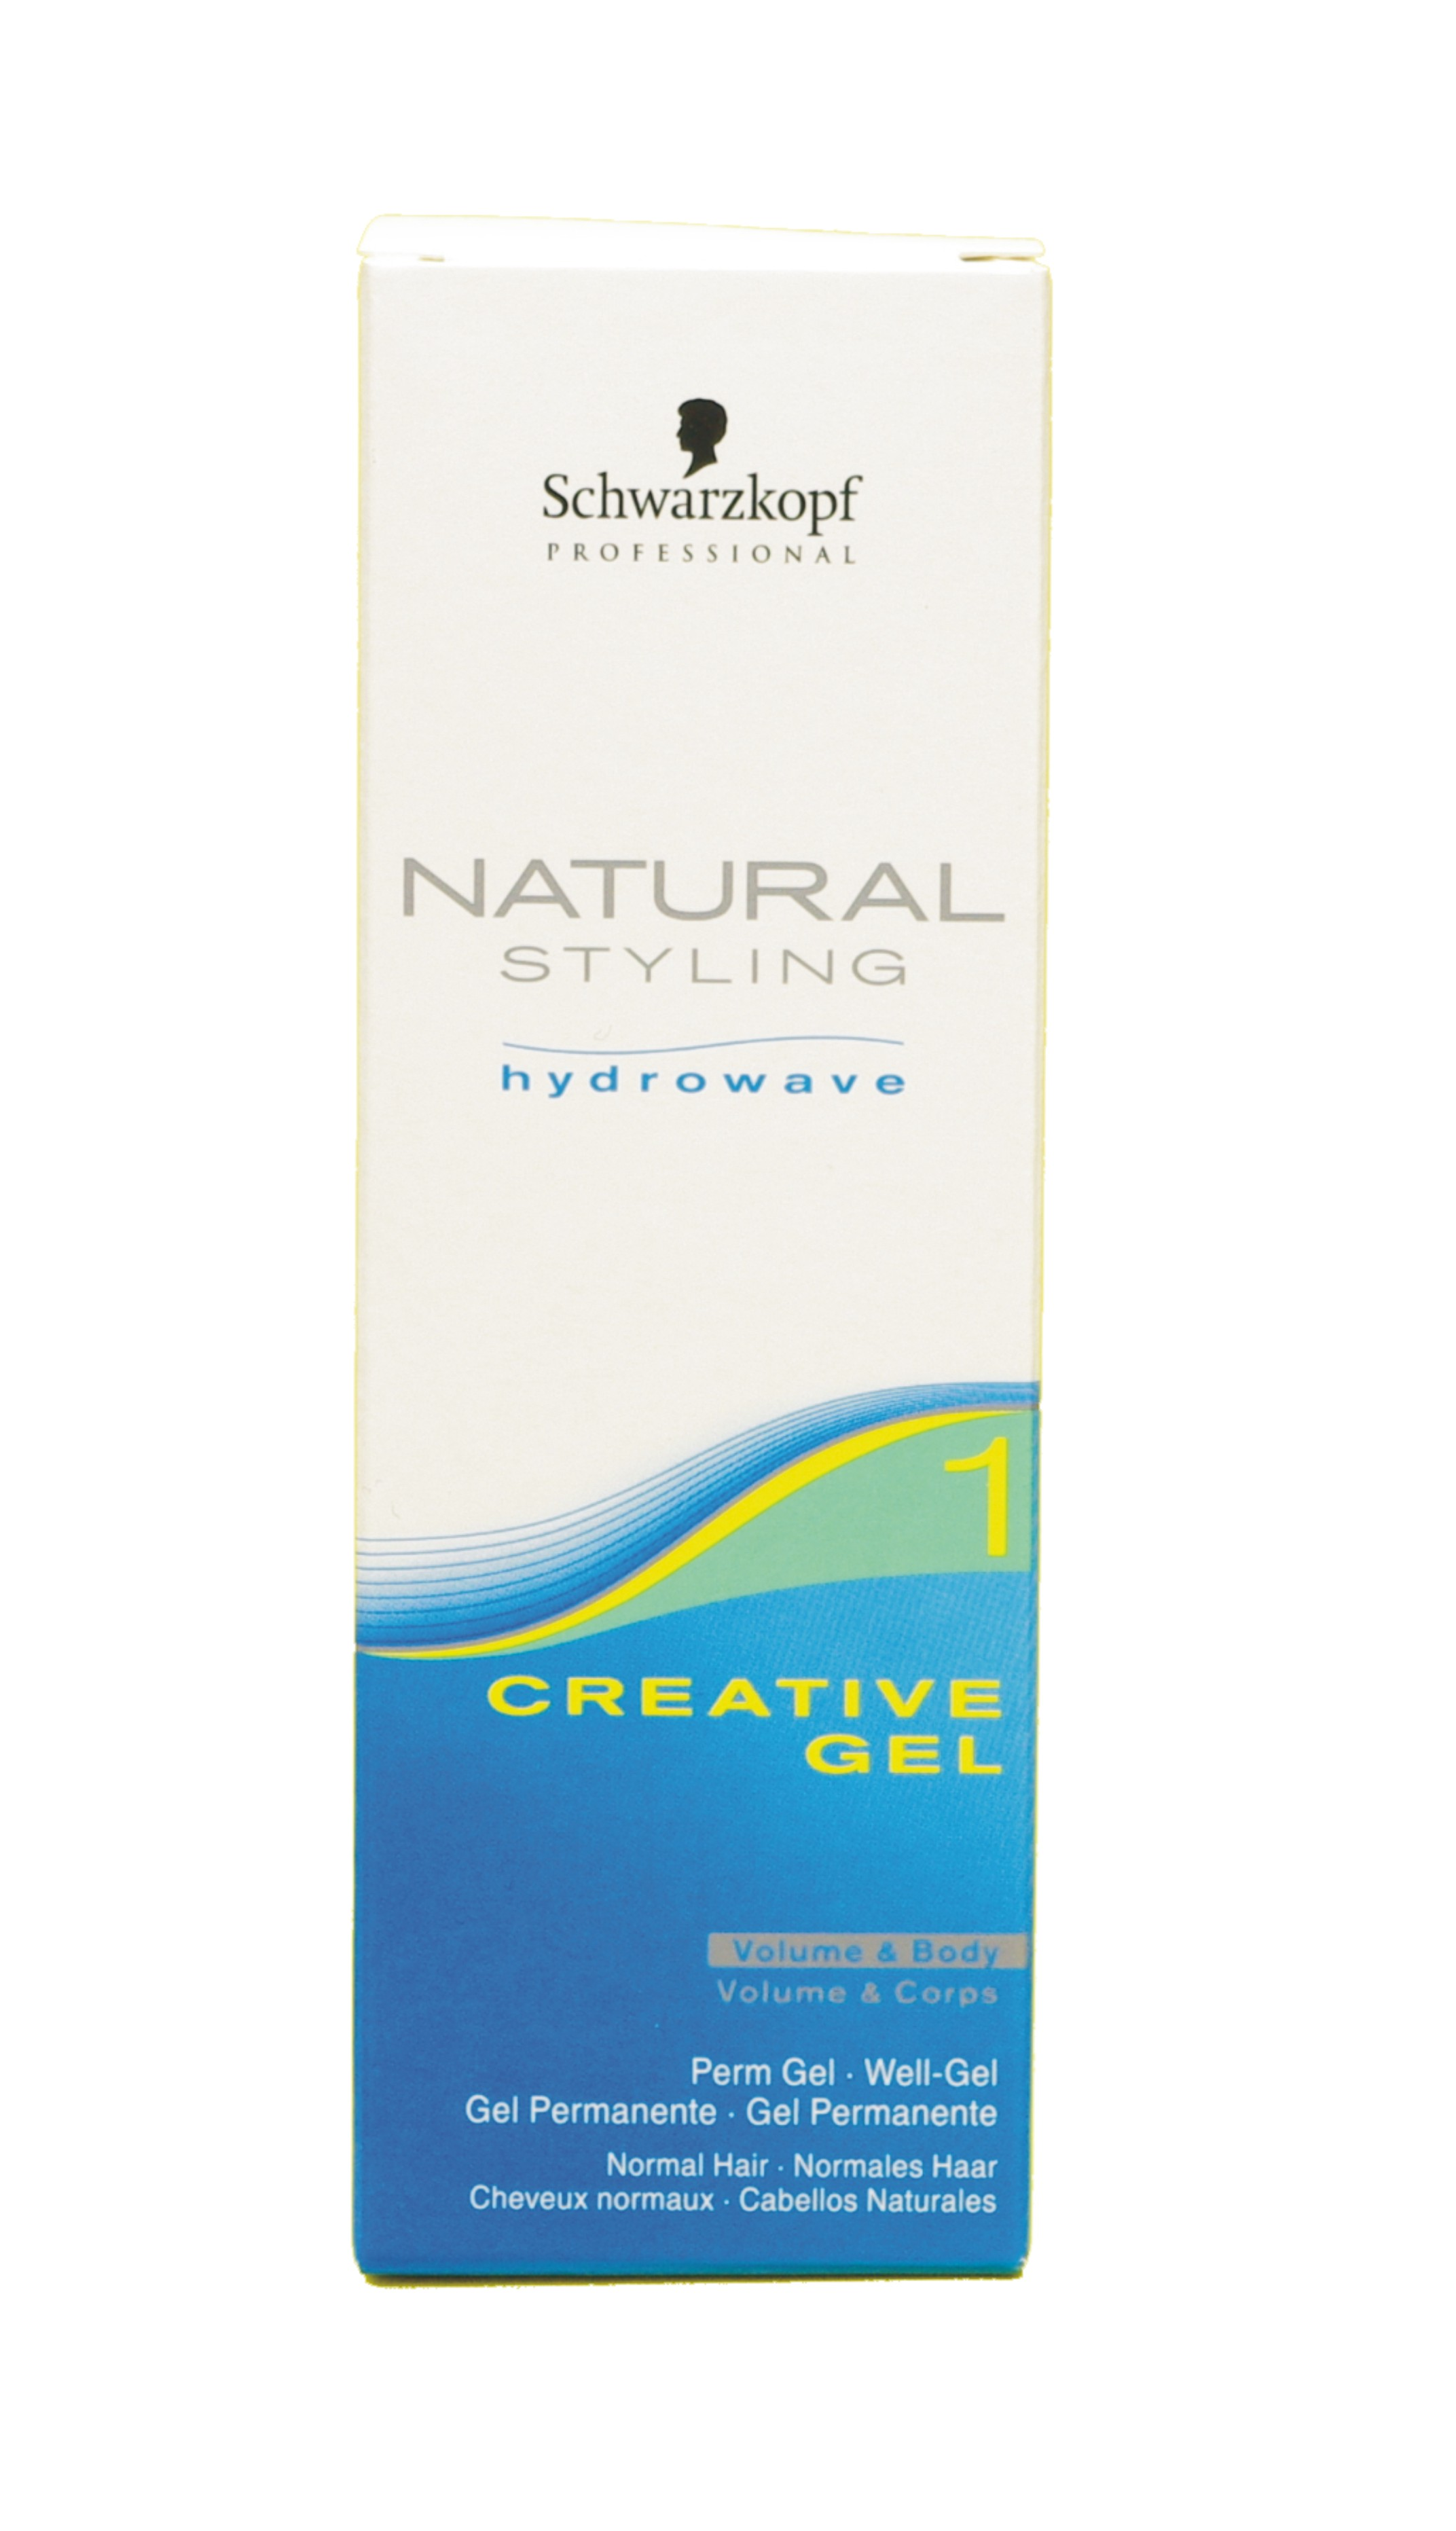 Schwarzkopf NATURAL STYLING Creative Gel 1, 50 ml